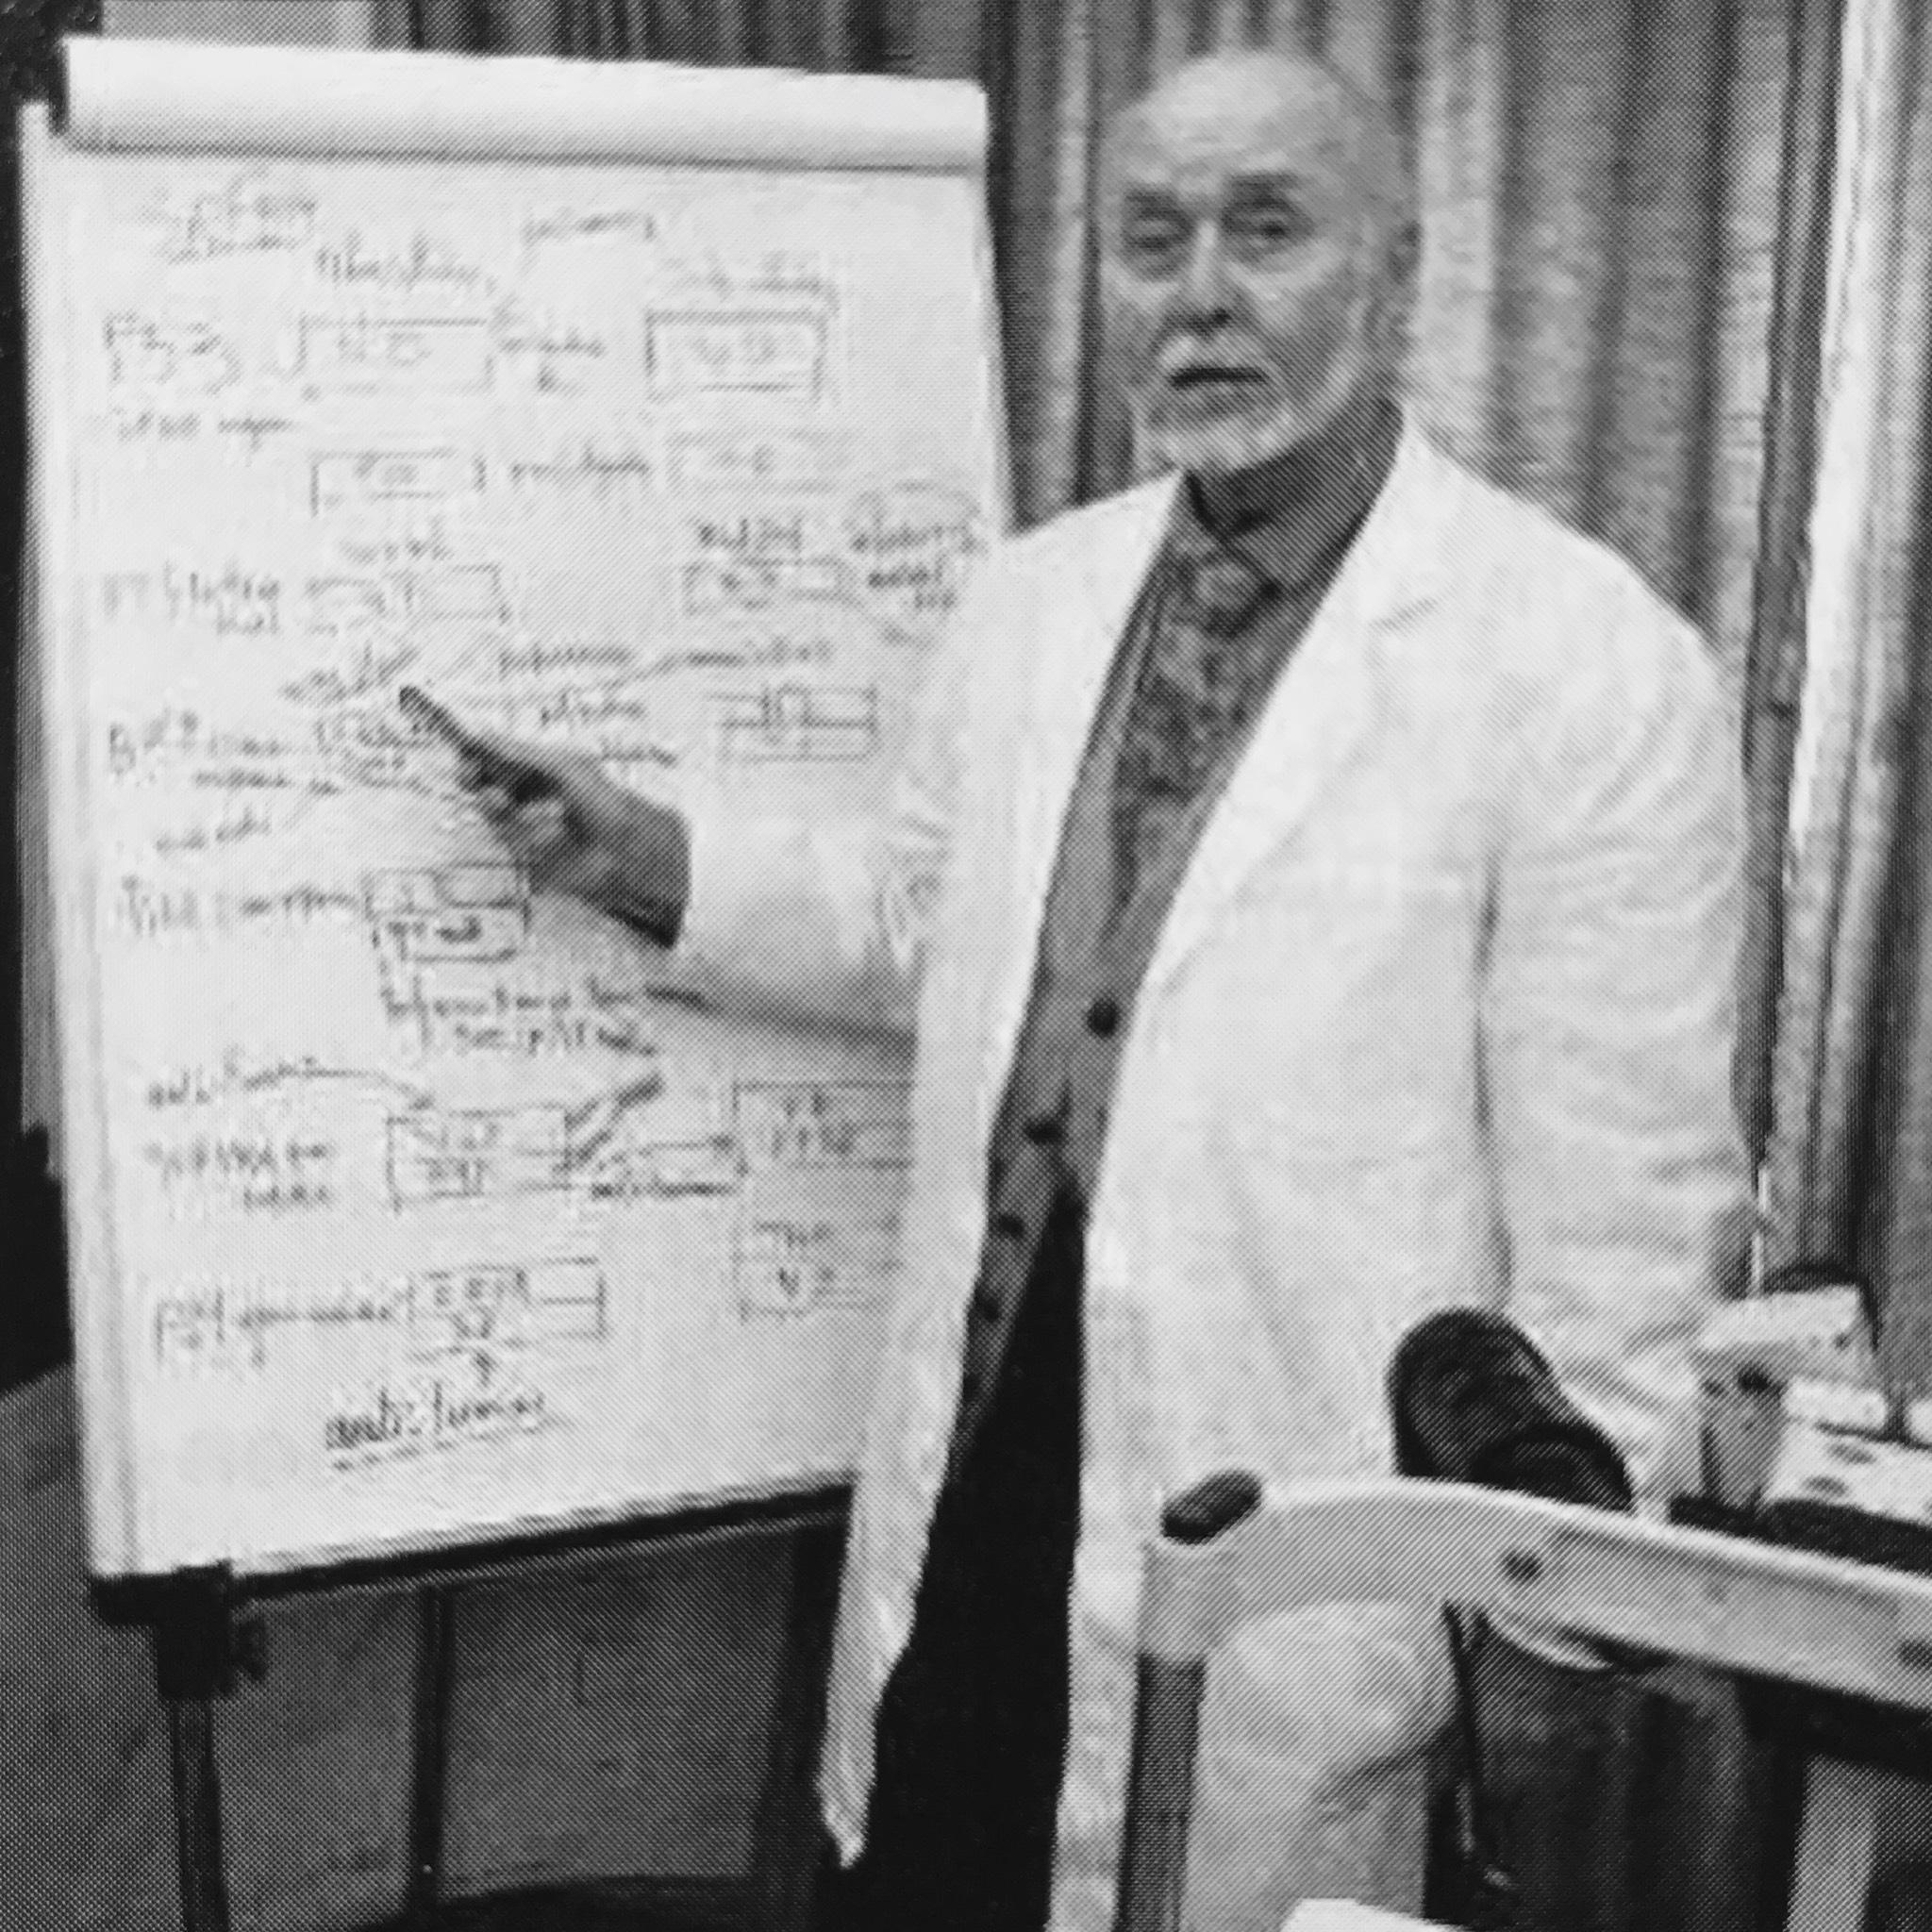 The Author, Professor Serge Jurasunas